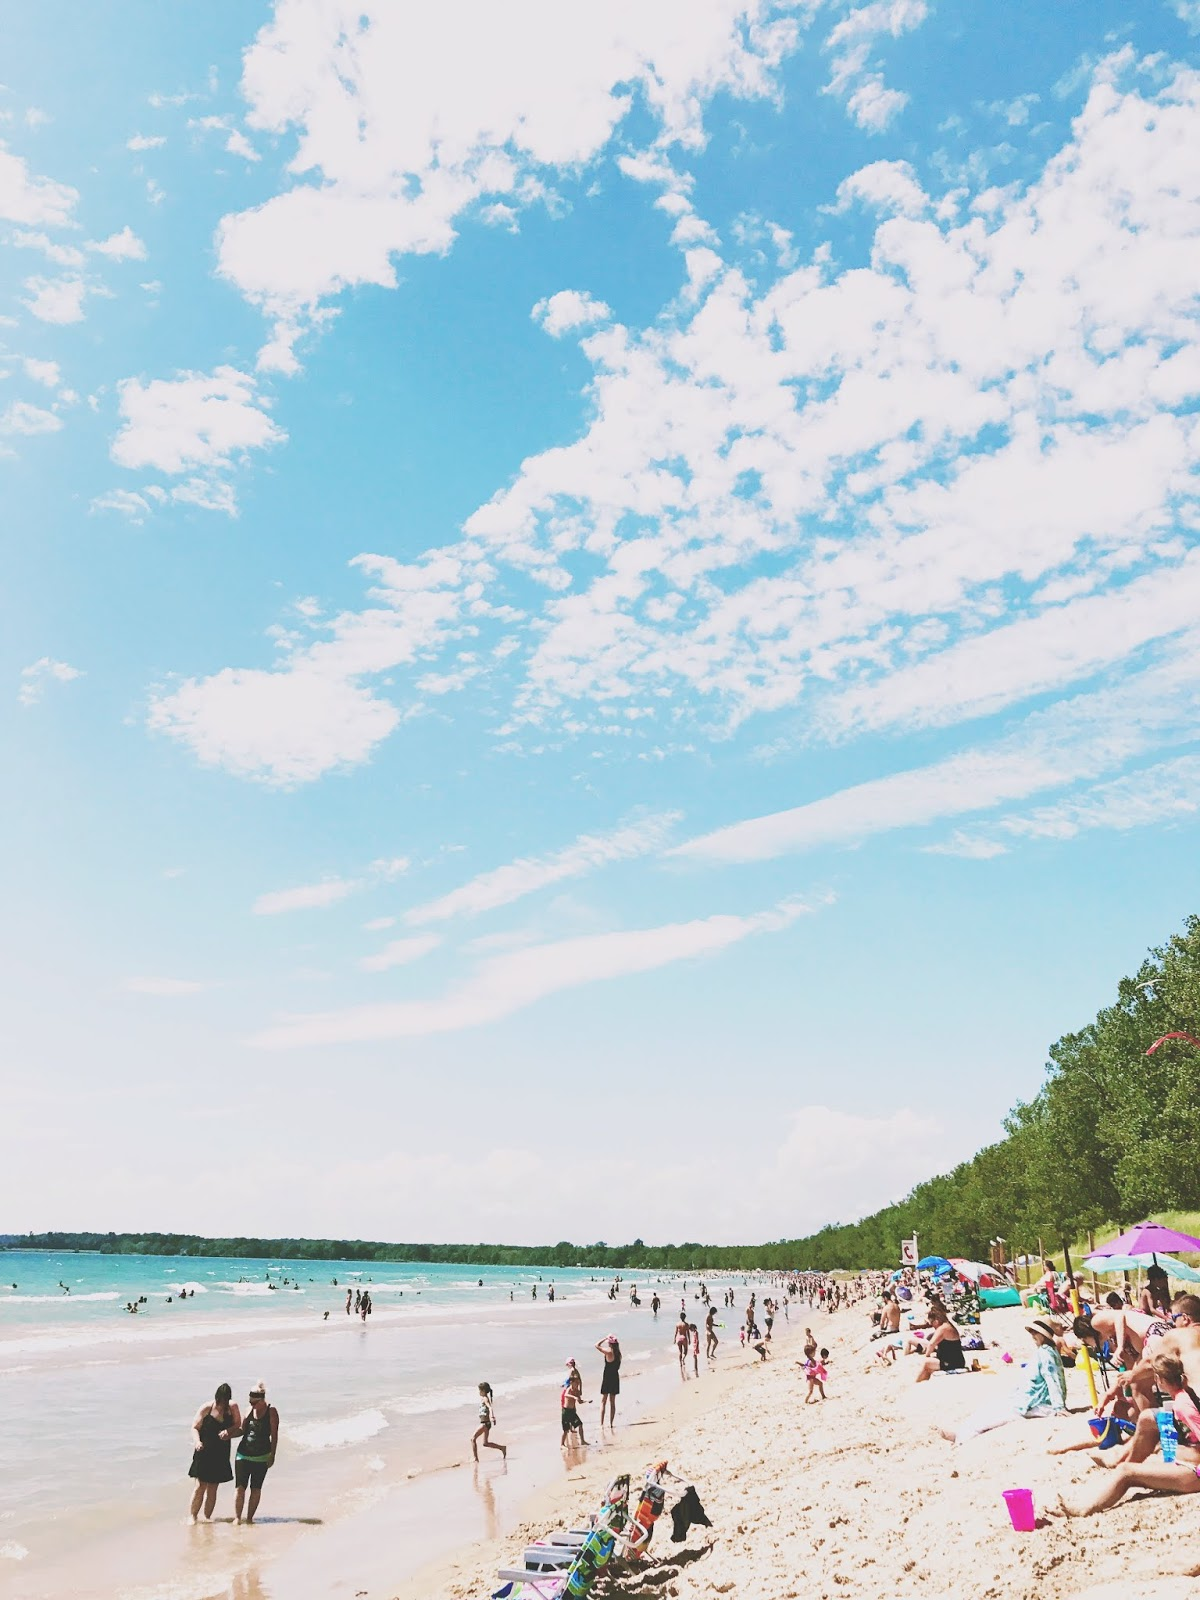 sandbanks beach, prince edward county family resort, pec cottage, prince edward county with kids